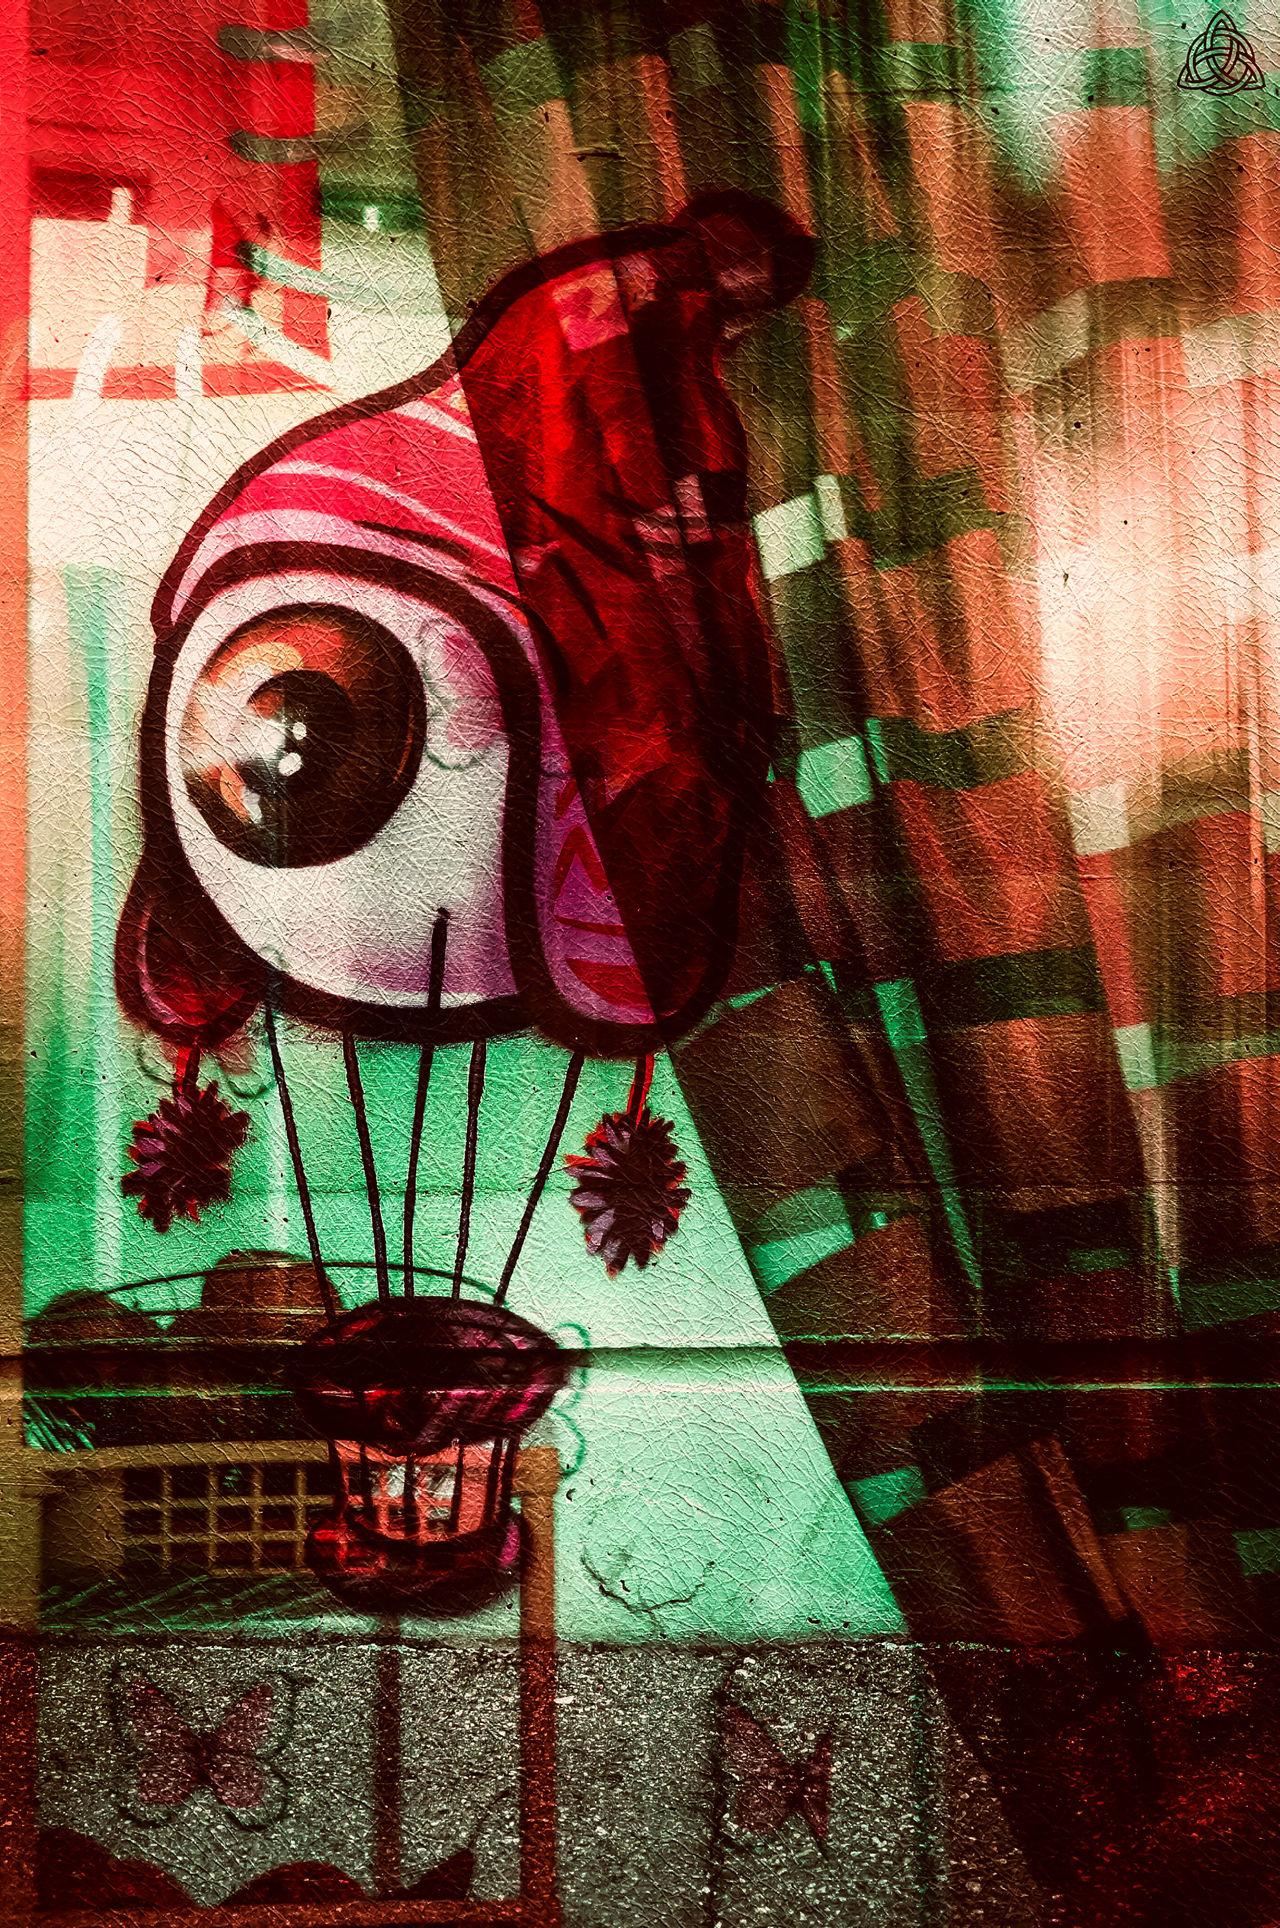 Opening of the soul... No People Day Red Lausanne, Switzerland EyeEm Market © From My Point Of View Tranquility Eyem Collection EyeEm Gallery EyeEm Masterclass EyeEm Best Shots EyeEm Best Edits Abstract Backgrounds Abstraction Abstractions Abstract Expressionism Abstracto Abstract Art Abstract Abstract Photography Abstractions In Colors Eyem Multi Colored Eyem Best Shots Scenics